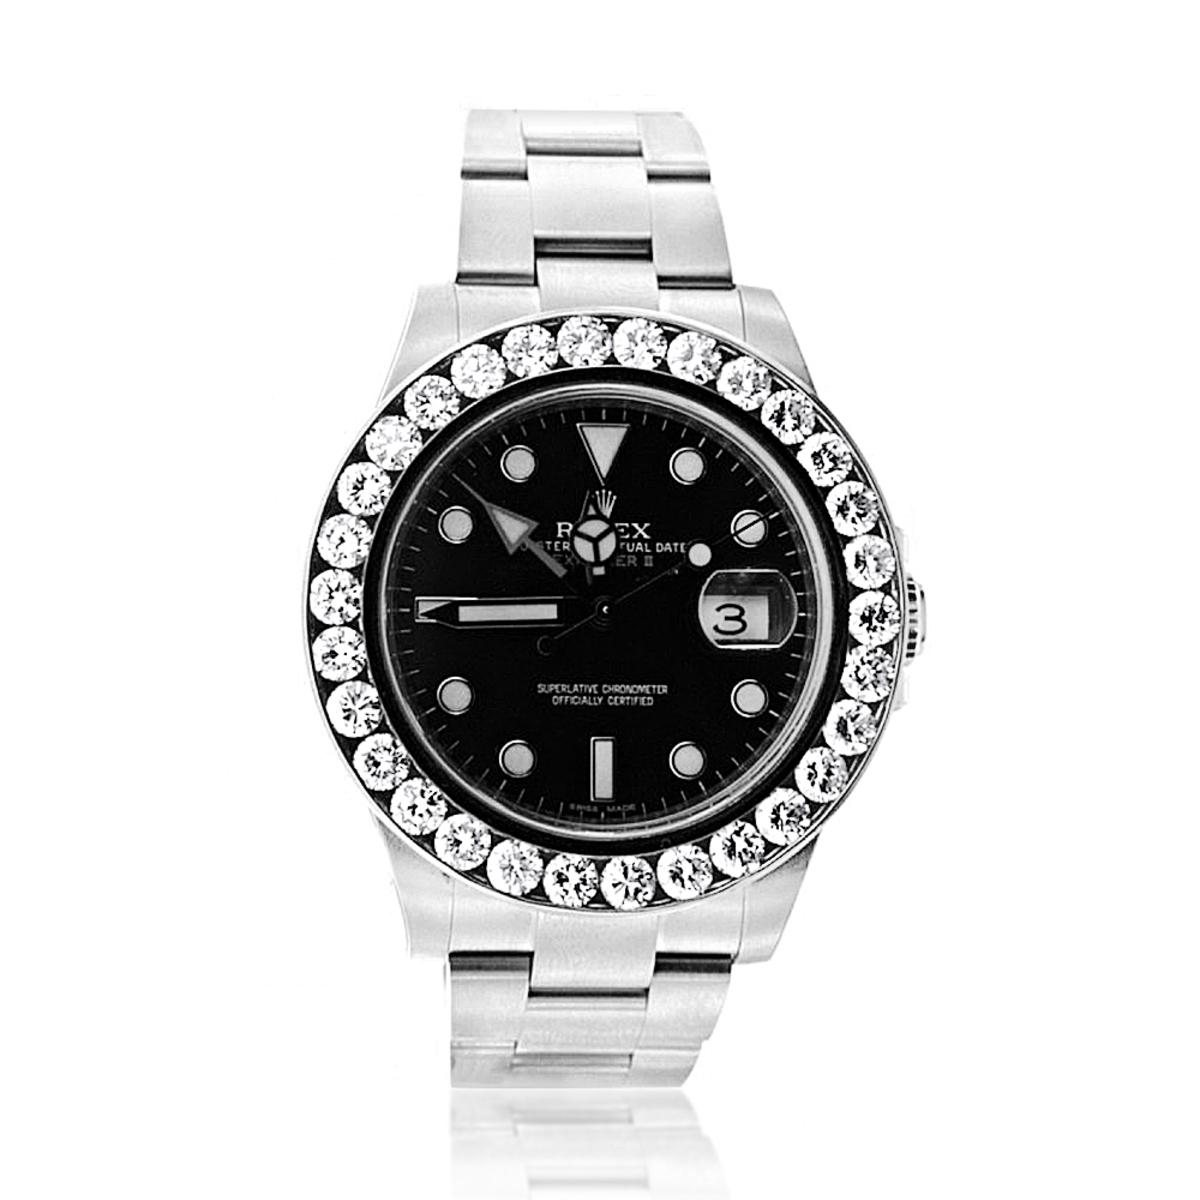 Rolex Explorer II Mens Diamond Bezel Watch Stainless Steel Black Dial 5ct